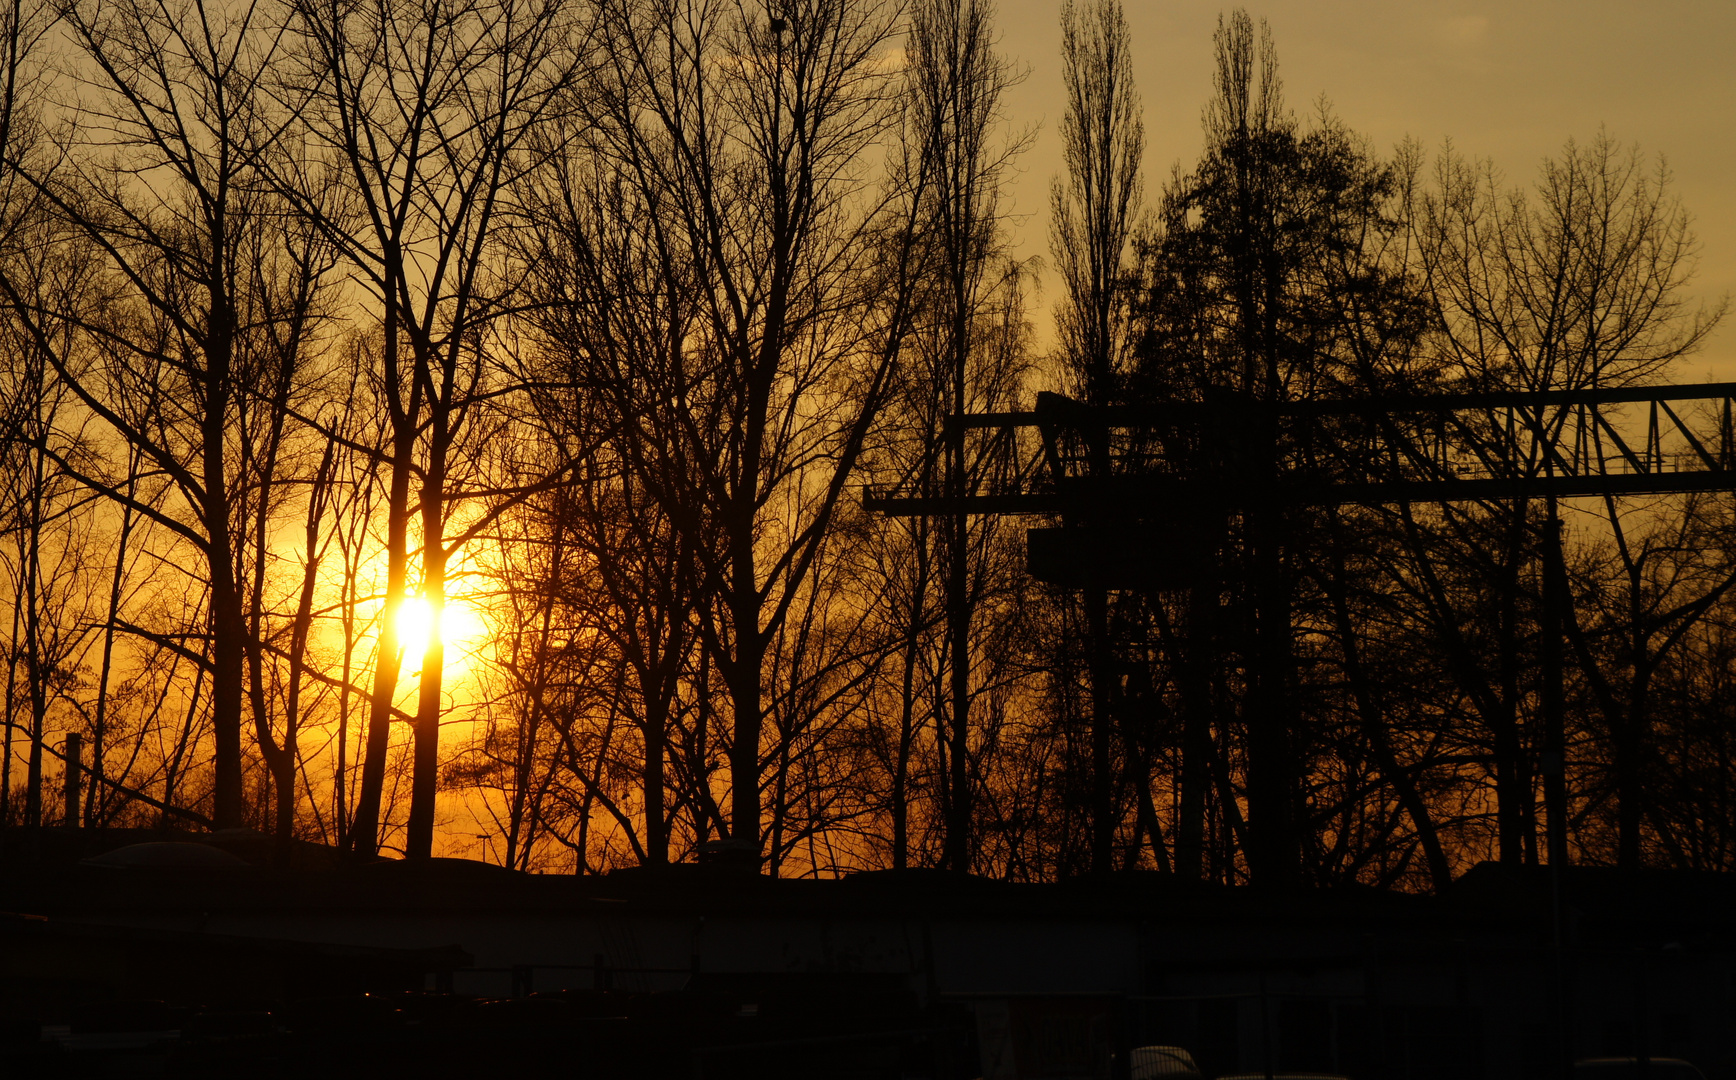 Sonnenuntergang, Dortmund Lindenhorst